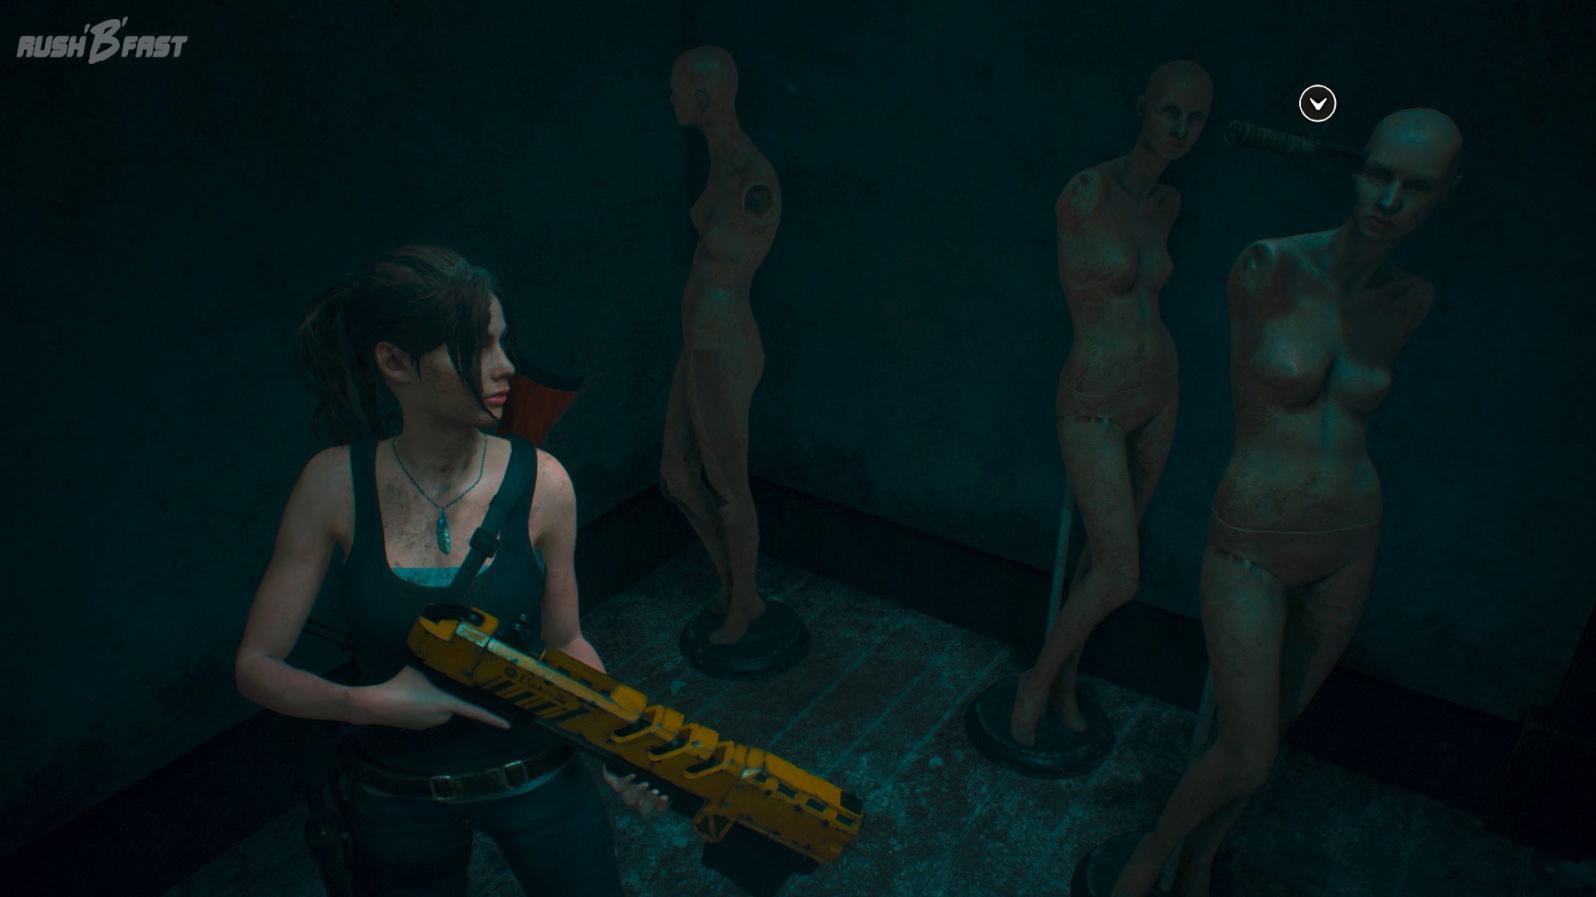 Resident Evil 2 (2019) - Drei Schaufensterpuppen aus Resident Evil 7 im Lagerraum.